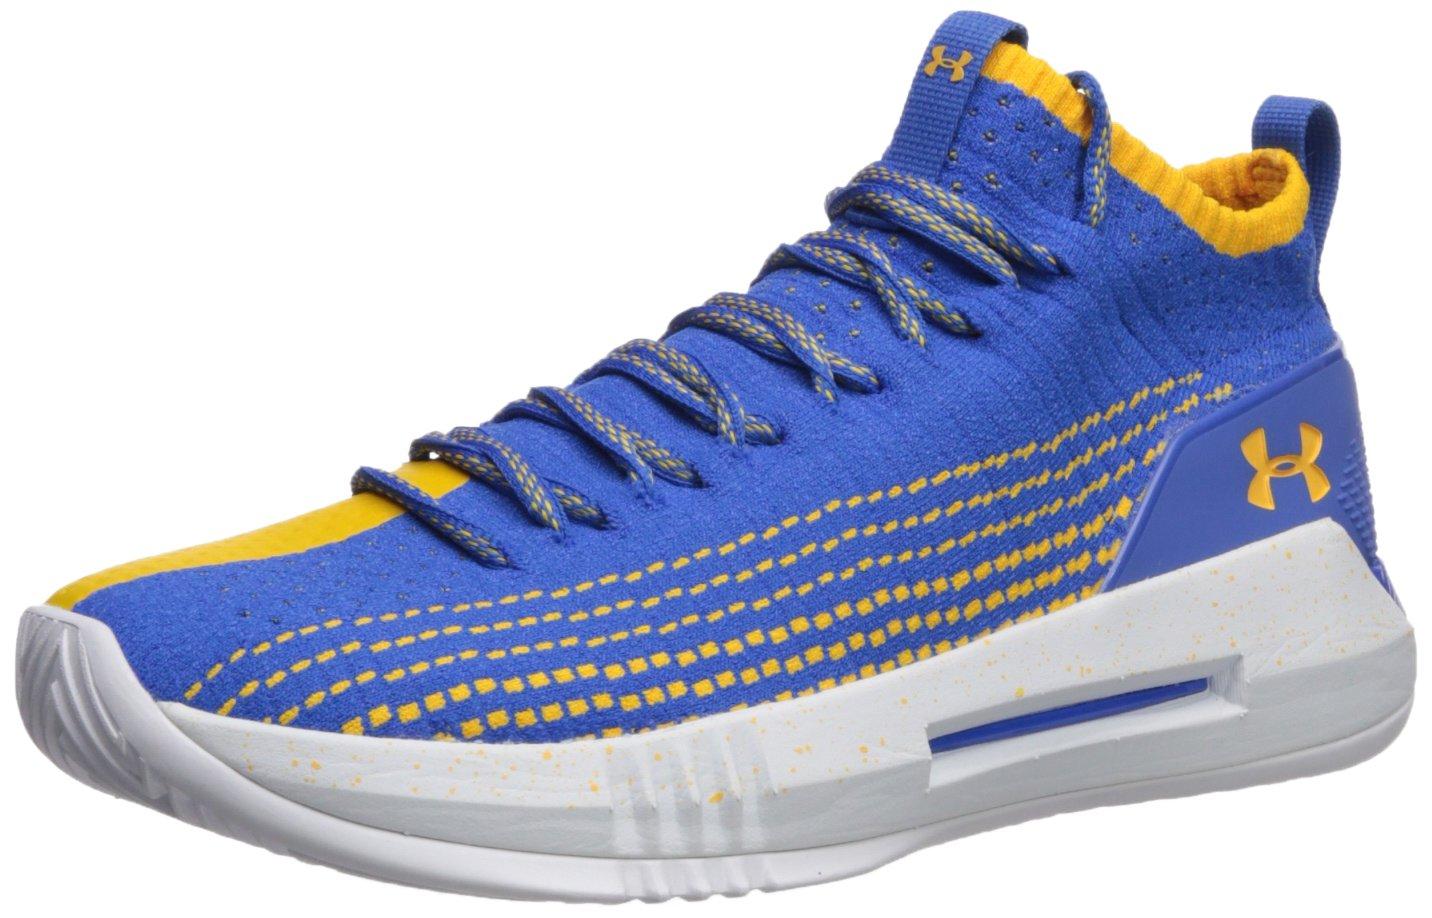 Under Armour Men's Heat Seeker Basketball Shoe B074ZC5QBC 9.5 M US|Powderkeg Blue (401)/White